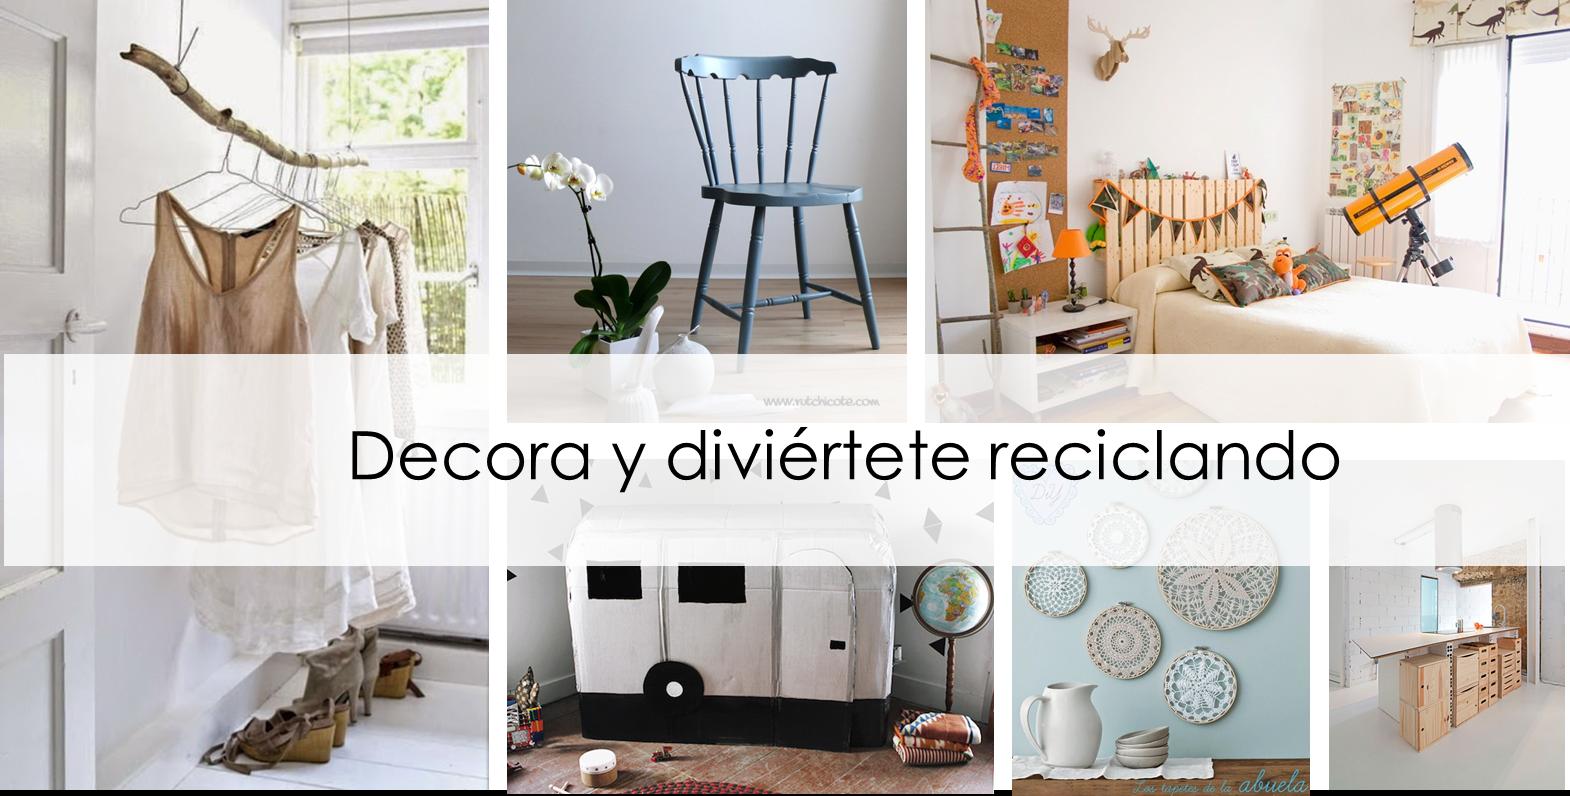 Asombroso reciclaje decoraci n hogar cresta ideas de for Decoracion hogar